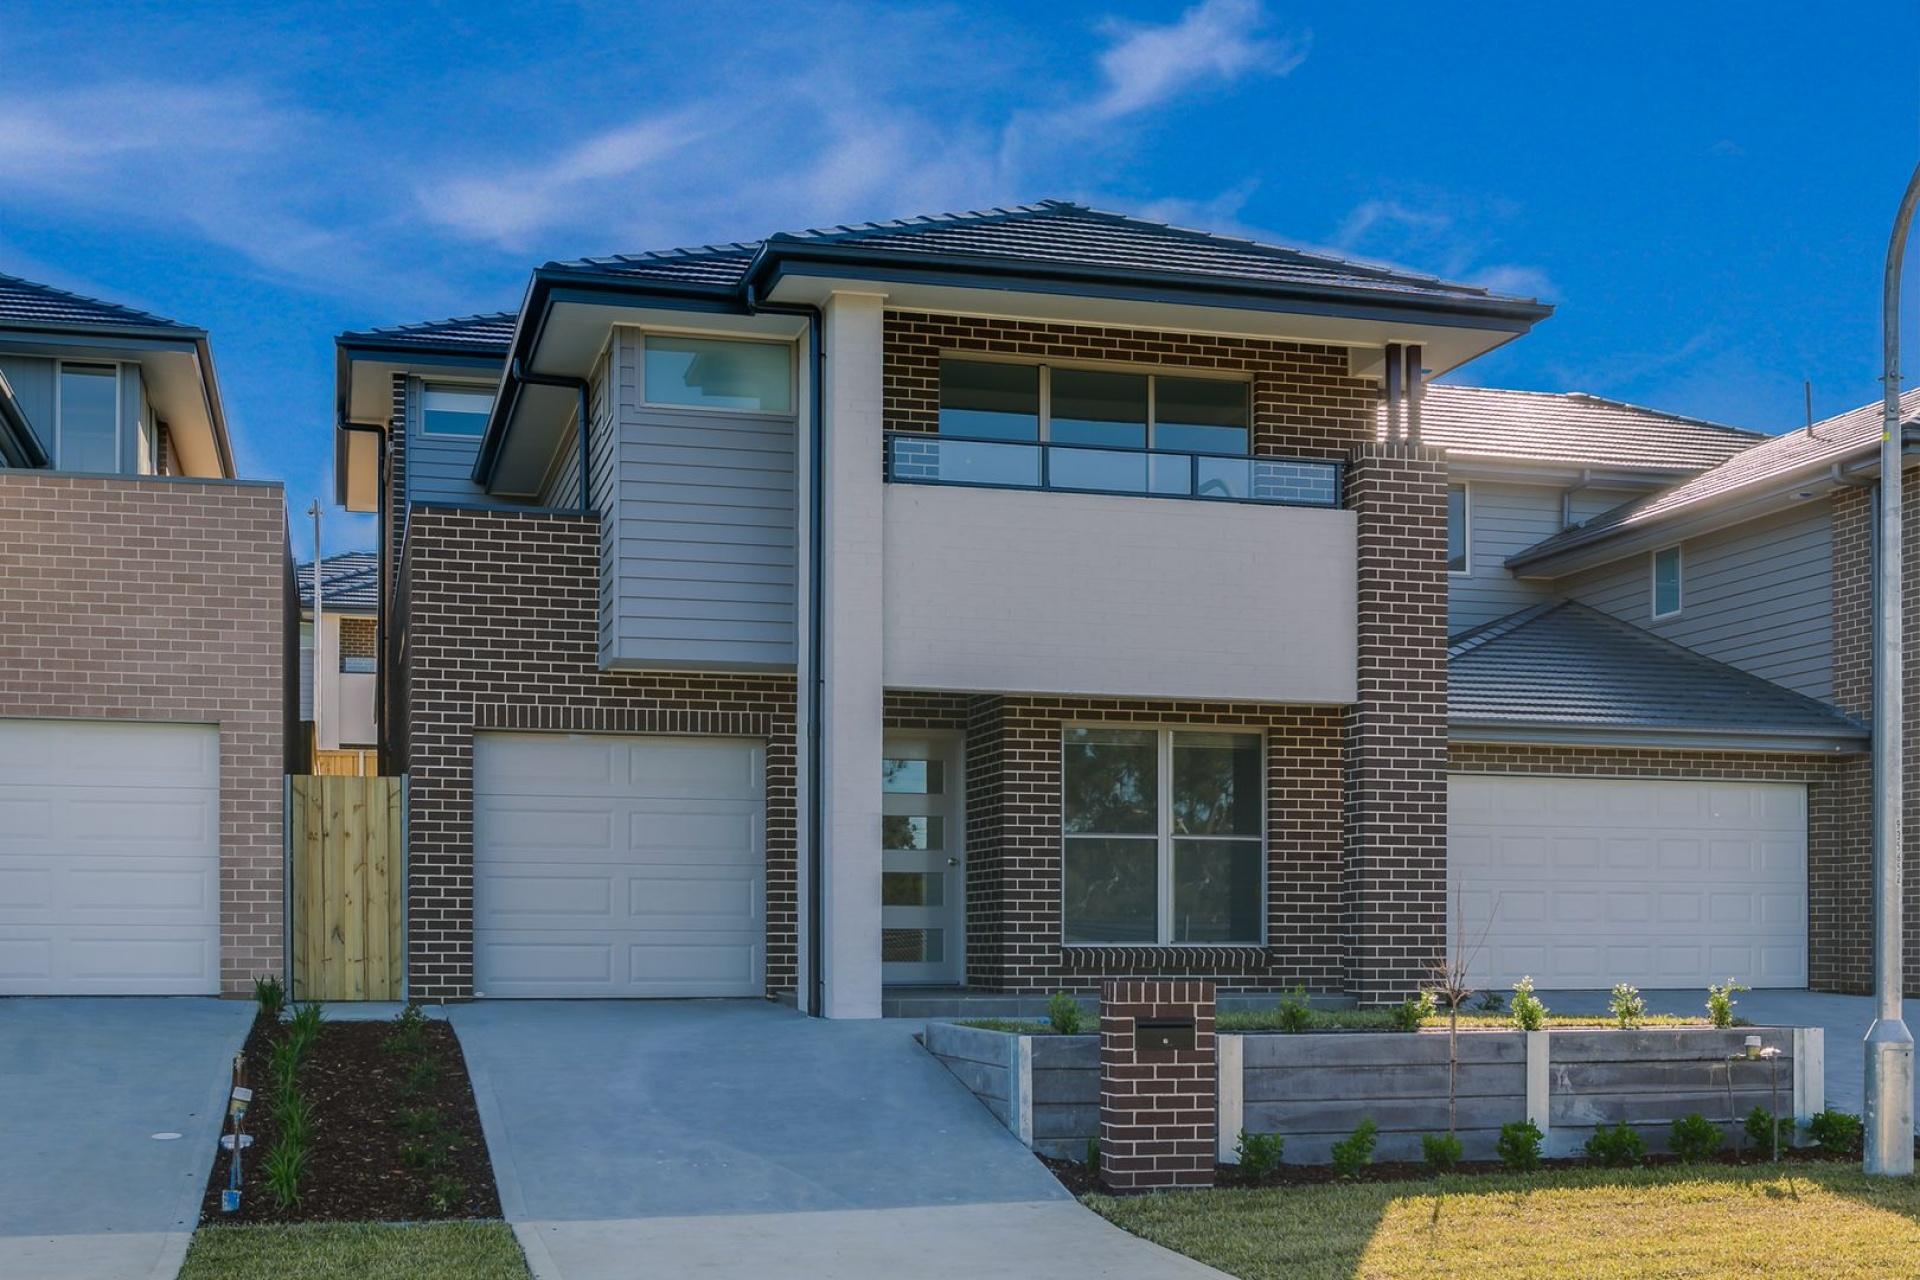 4 Rooms, House, Leased, Thorpe Way, 2 Bathrooms, Listing ID 1434, Box Hill , NSW, Australia, 2765,